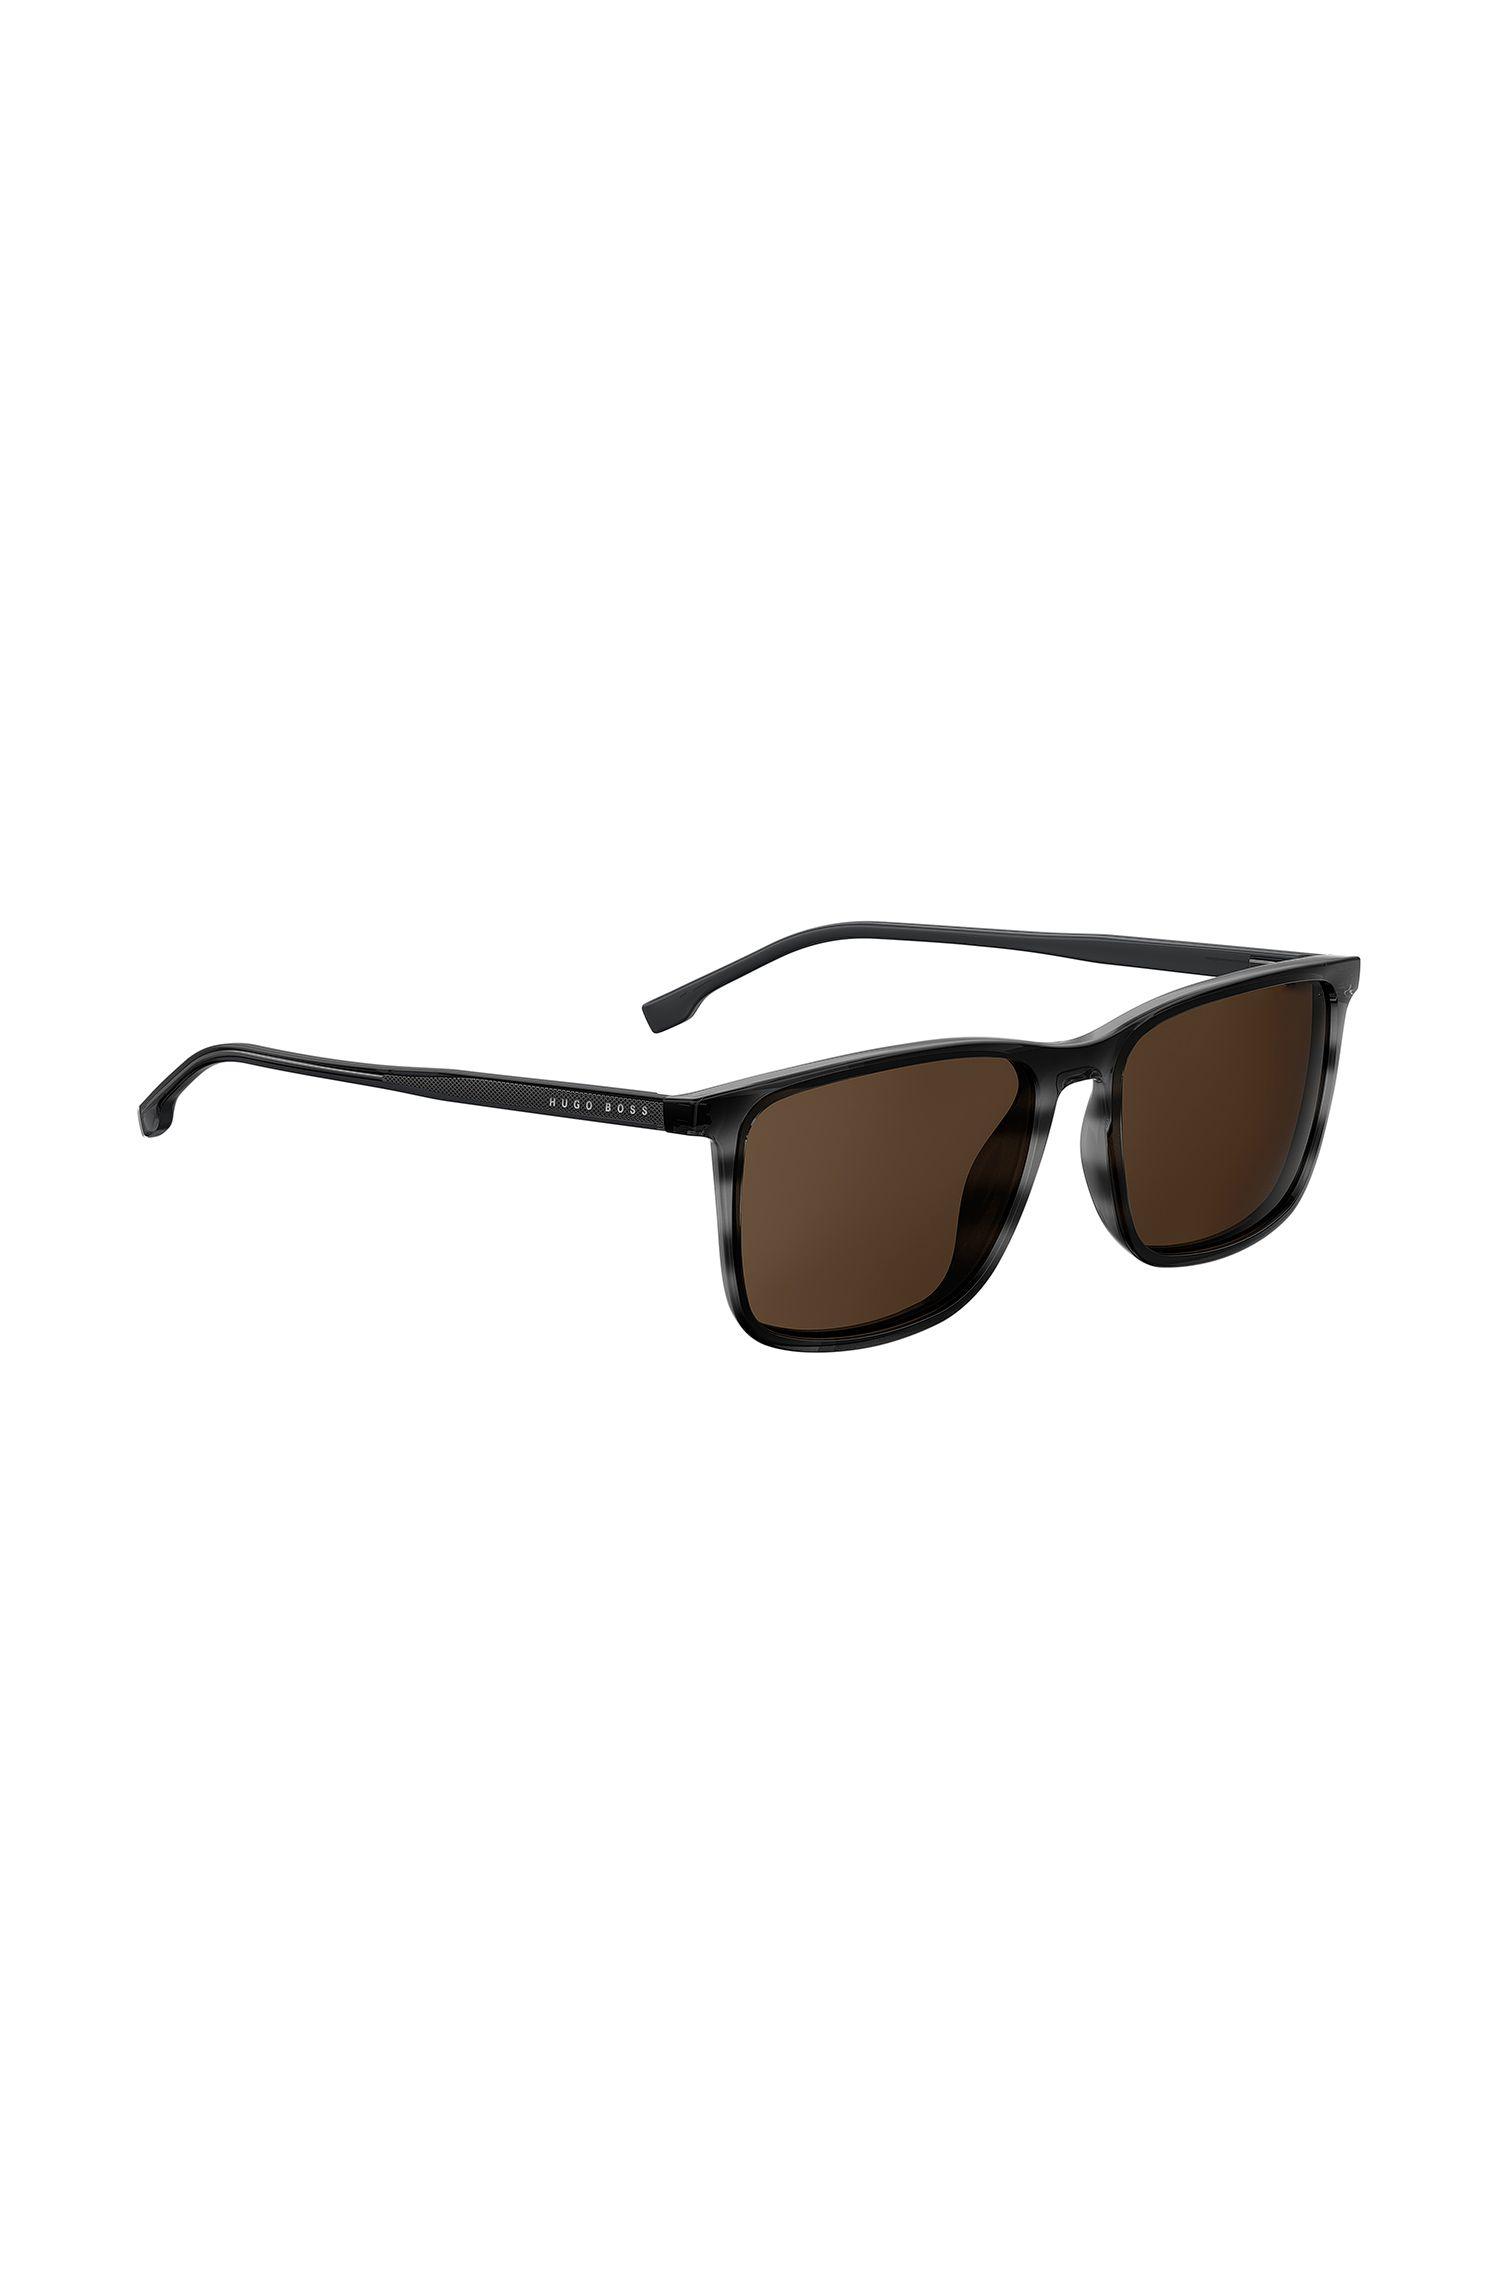 Rectangular sunglasses with grey horn Optyl frames, Black